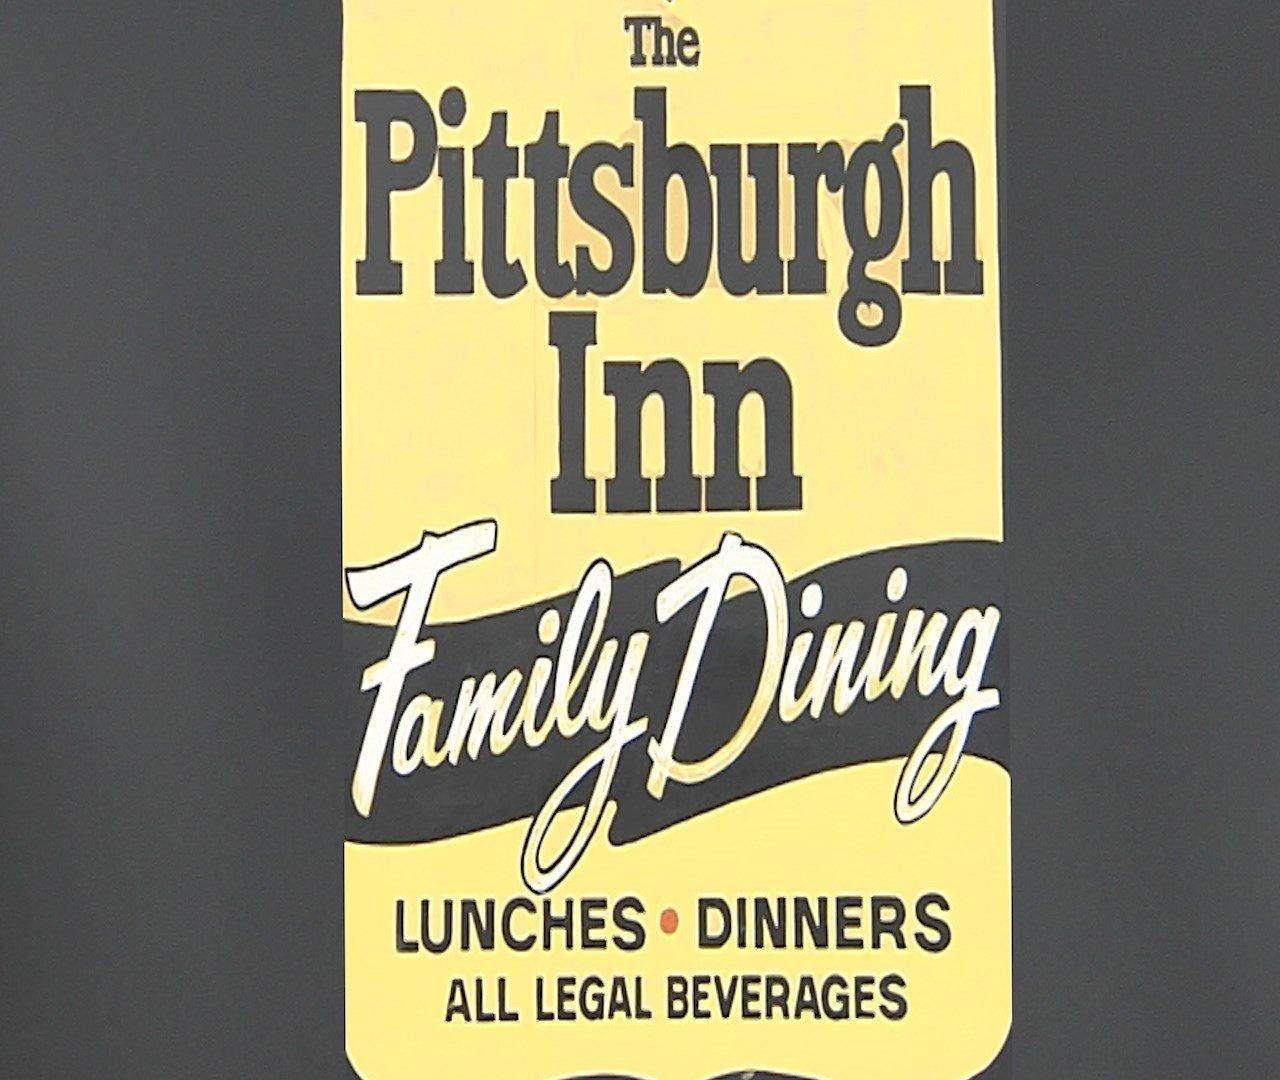 Pittsburgh Inn